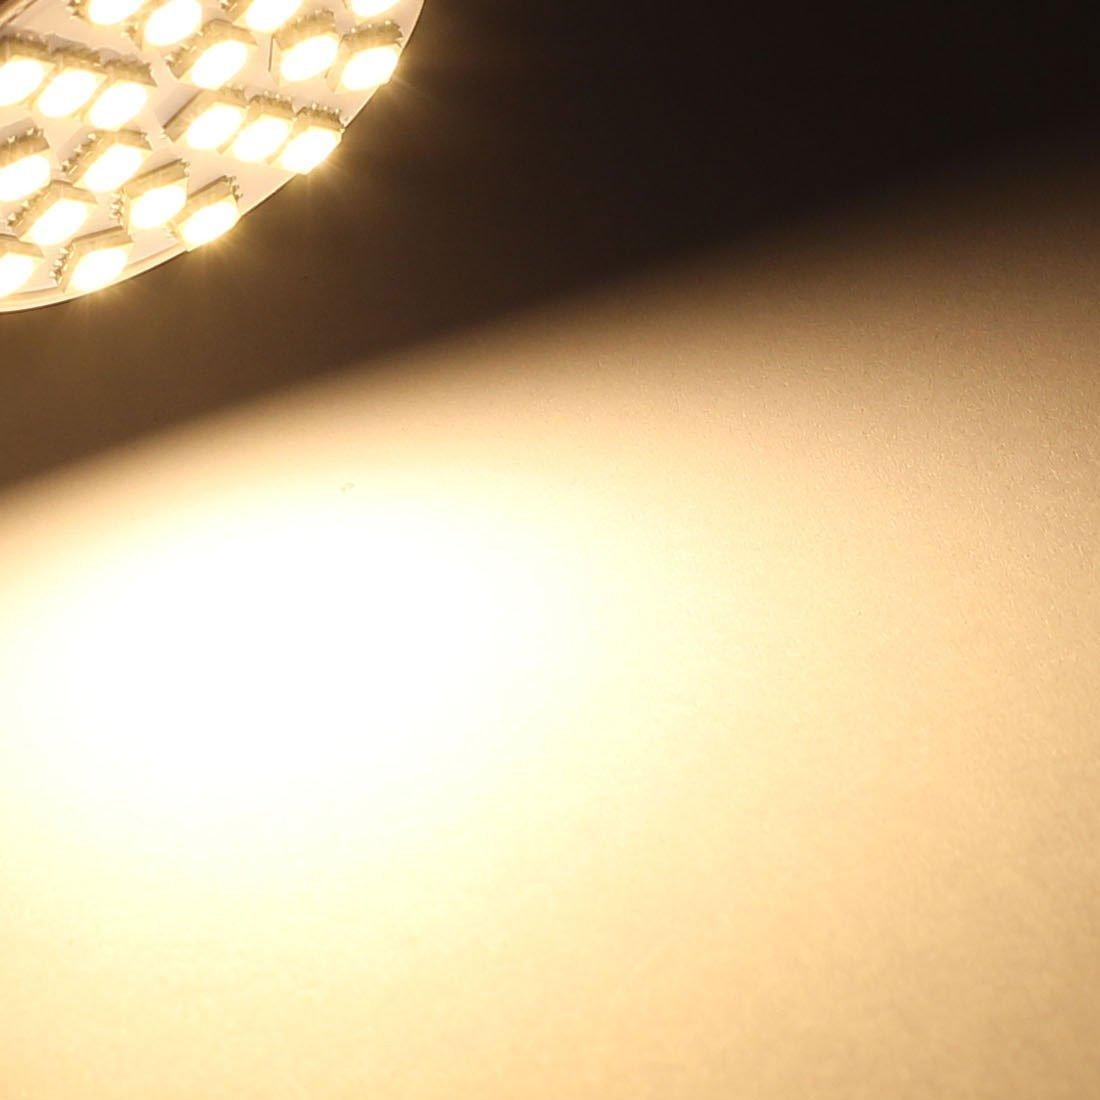 eDealMax MR16 SMD 5050 24 LED 3W 110V AC plástico lámpara ahorro de energía bombilla LED blanco cálido - - Amazon.com